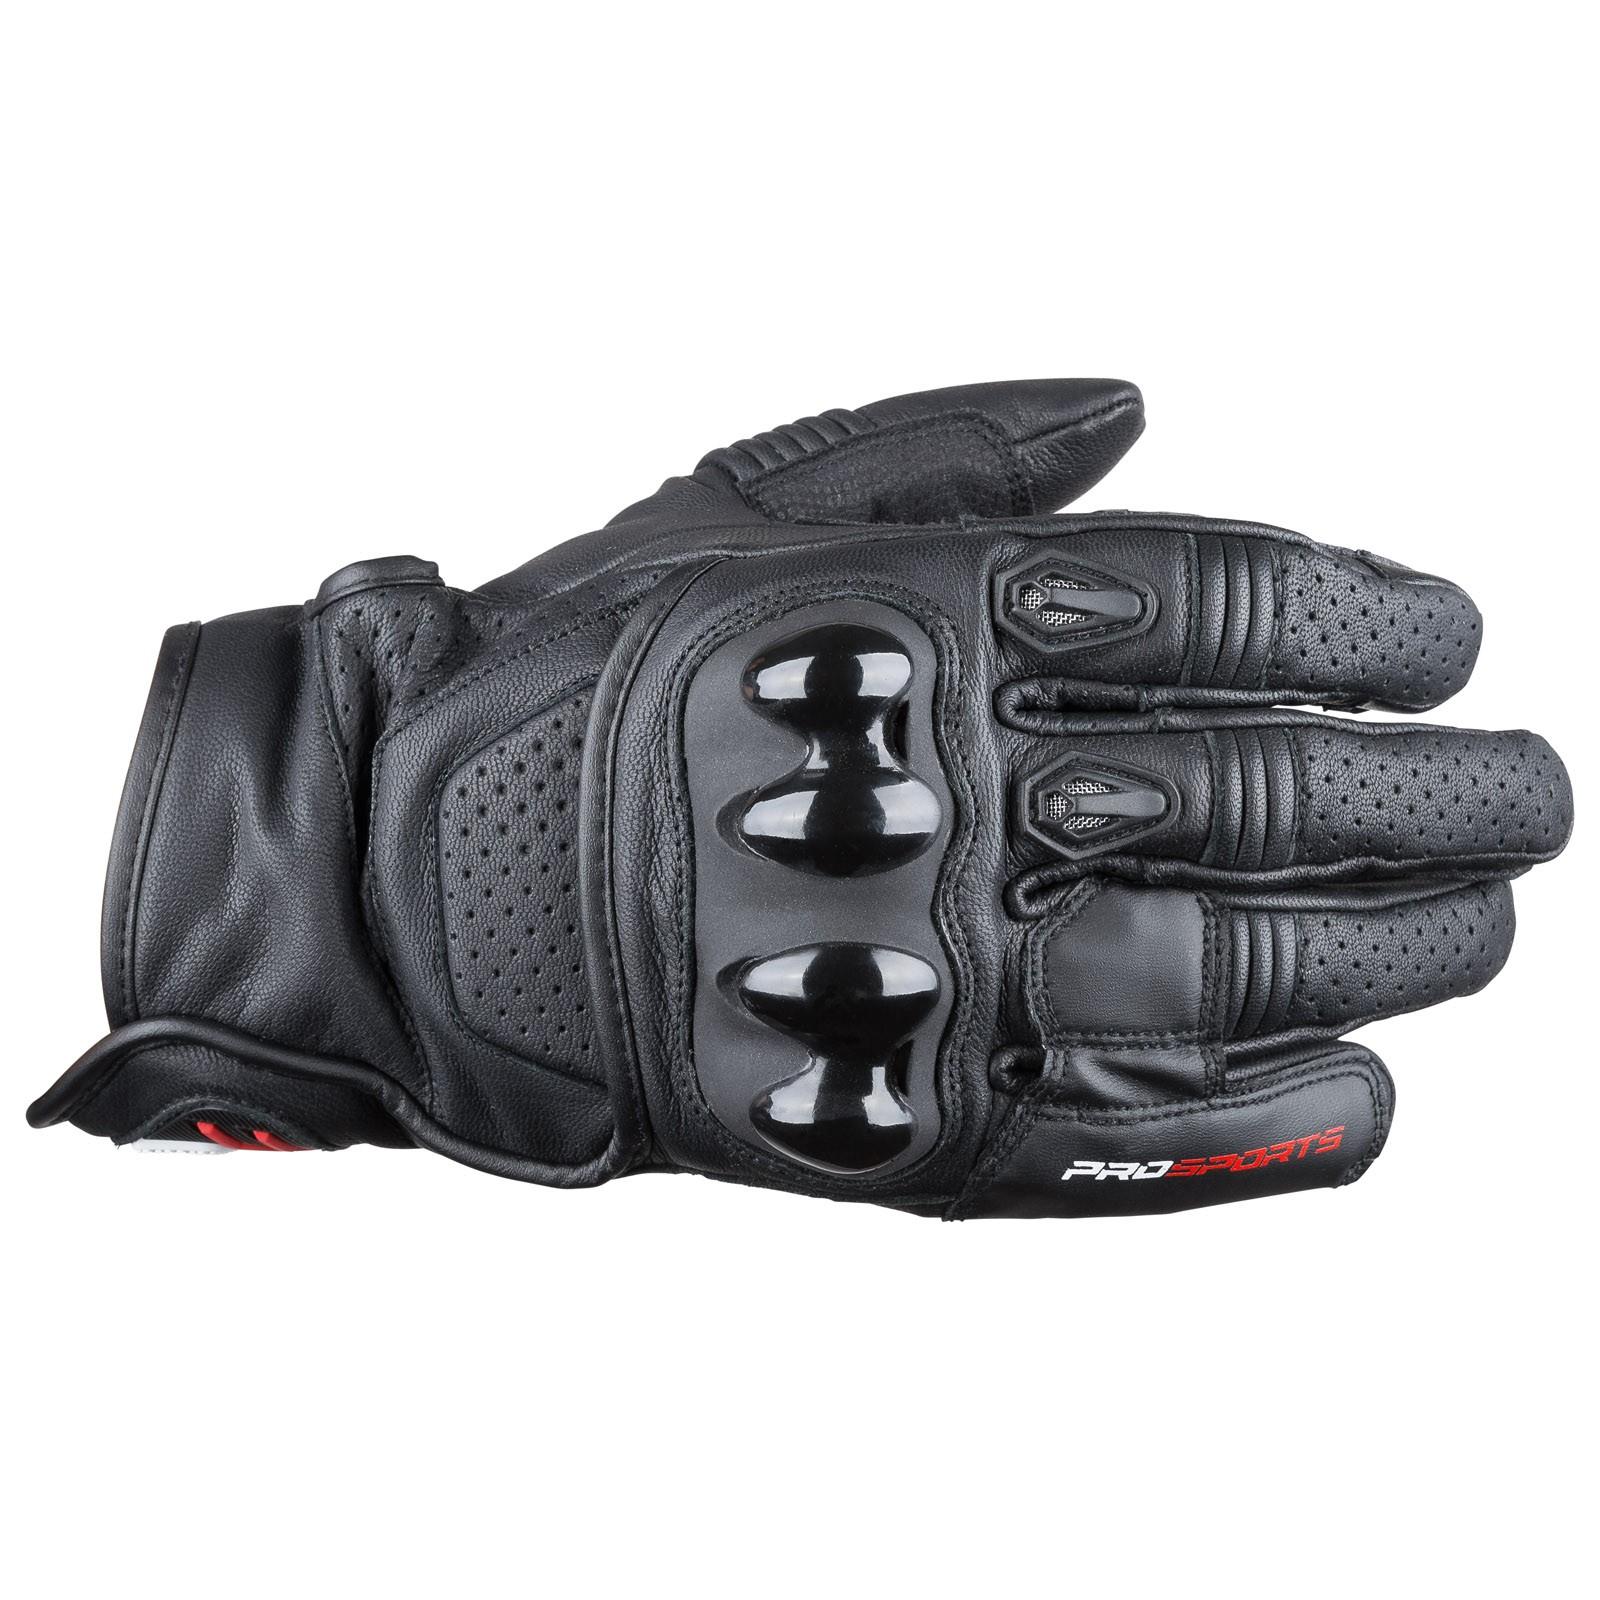 Pro Sports PSX-2 Lederhandschuh ab 20 Uhr